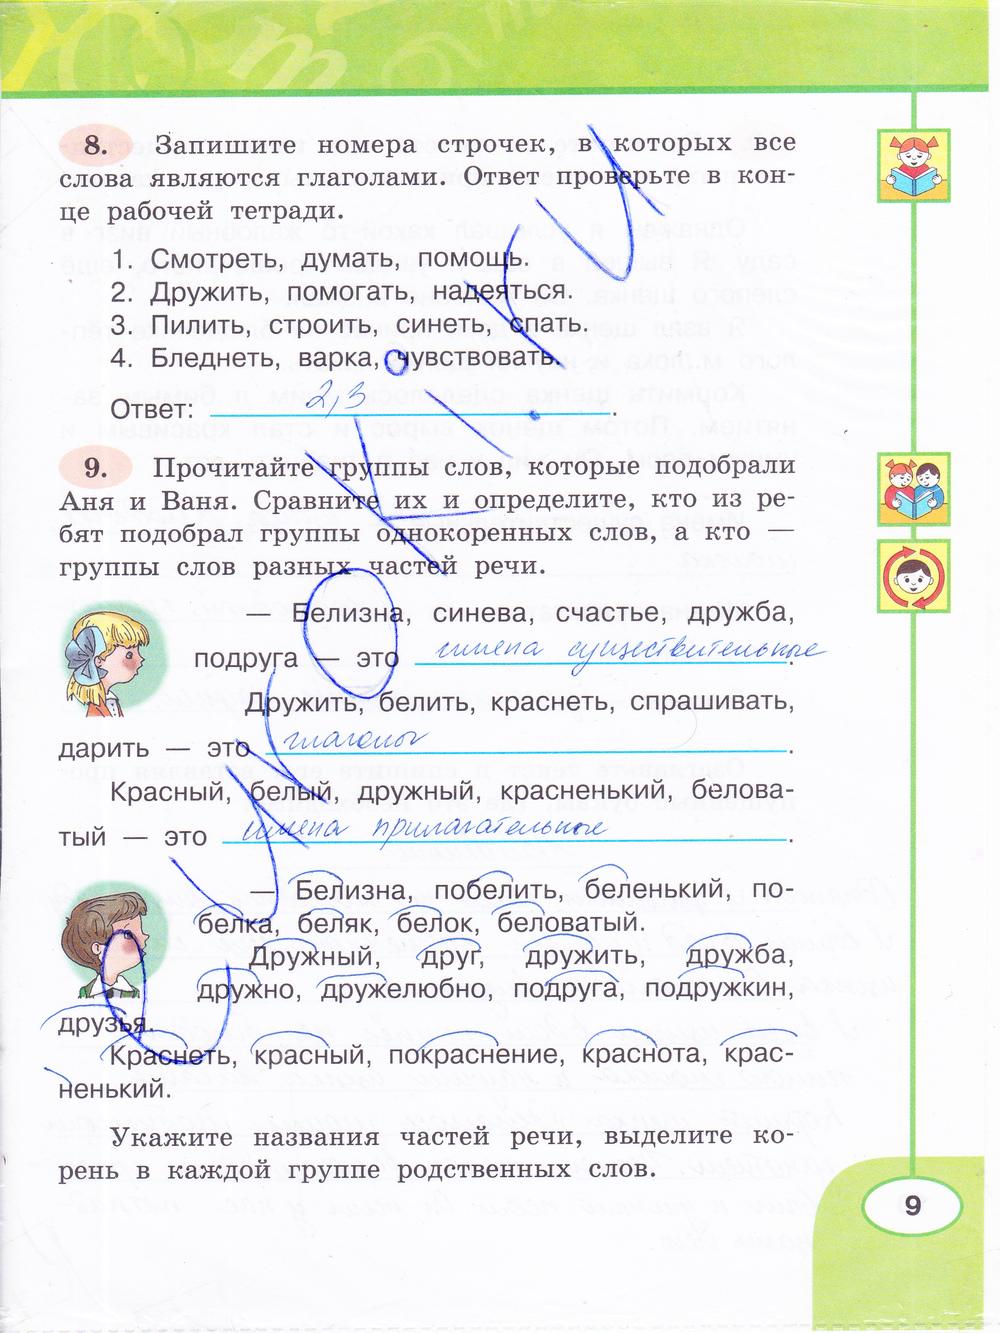 гдз по русскому языку за 3 класс климанова бабушкина рабочая тетрадь 2 часть